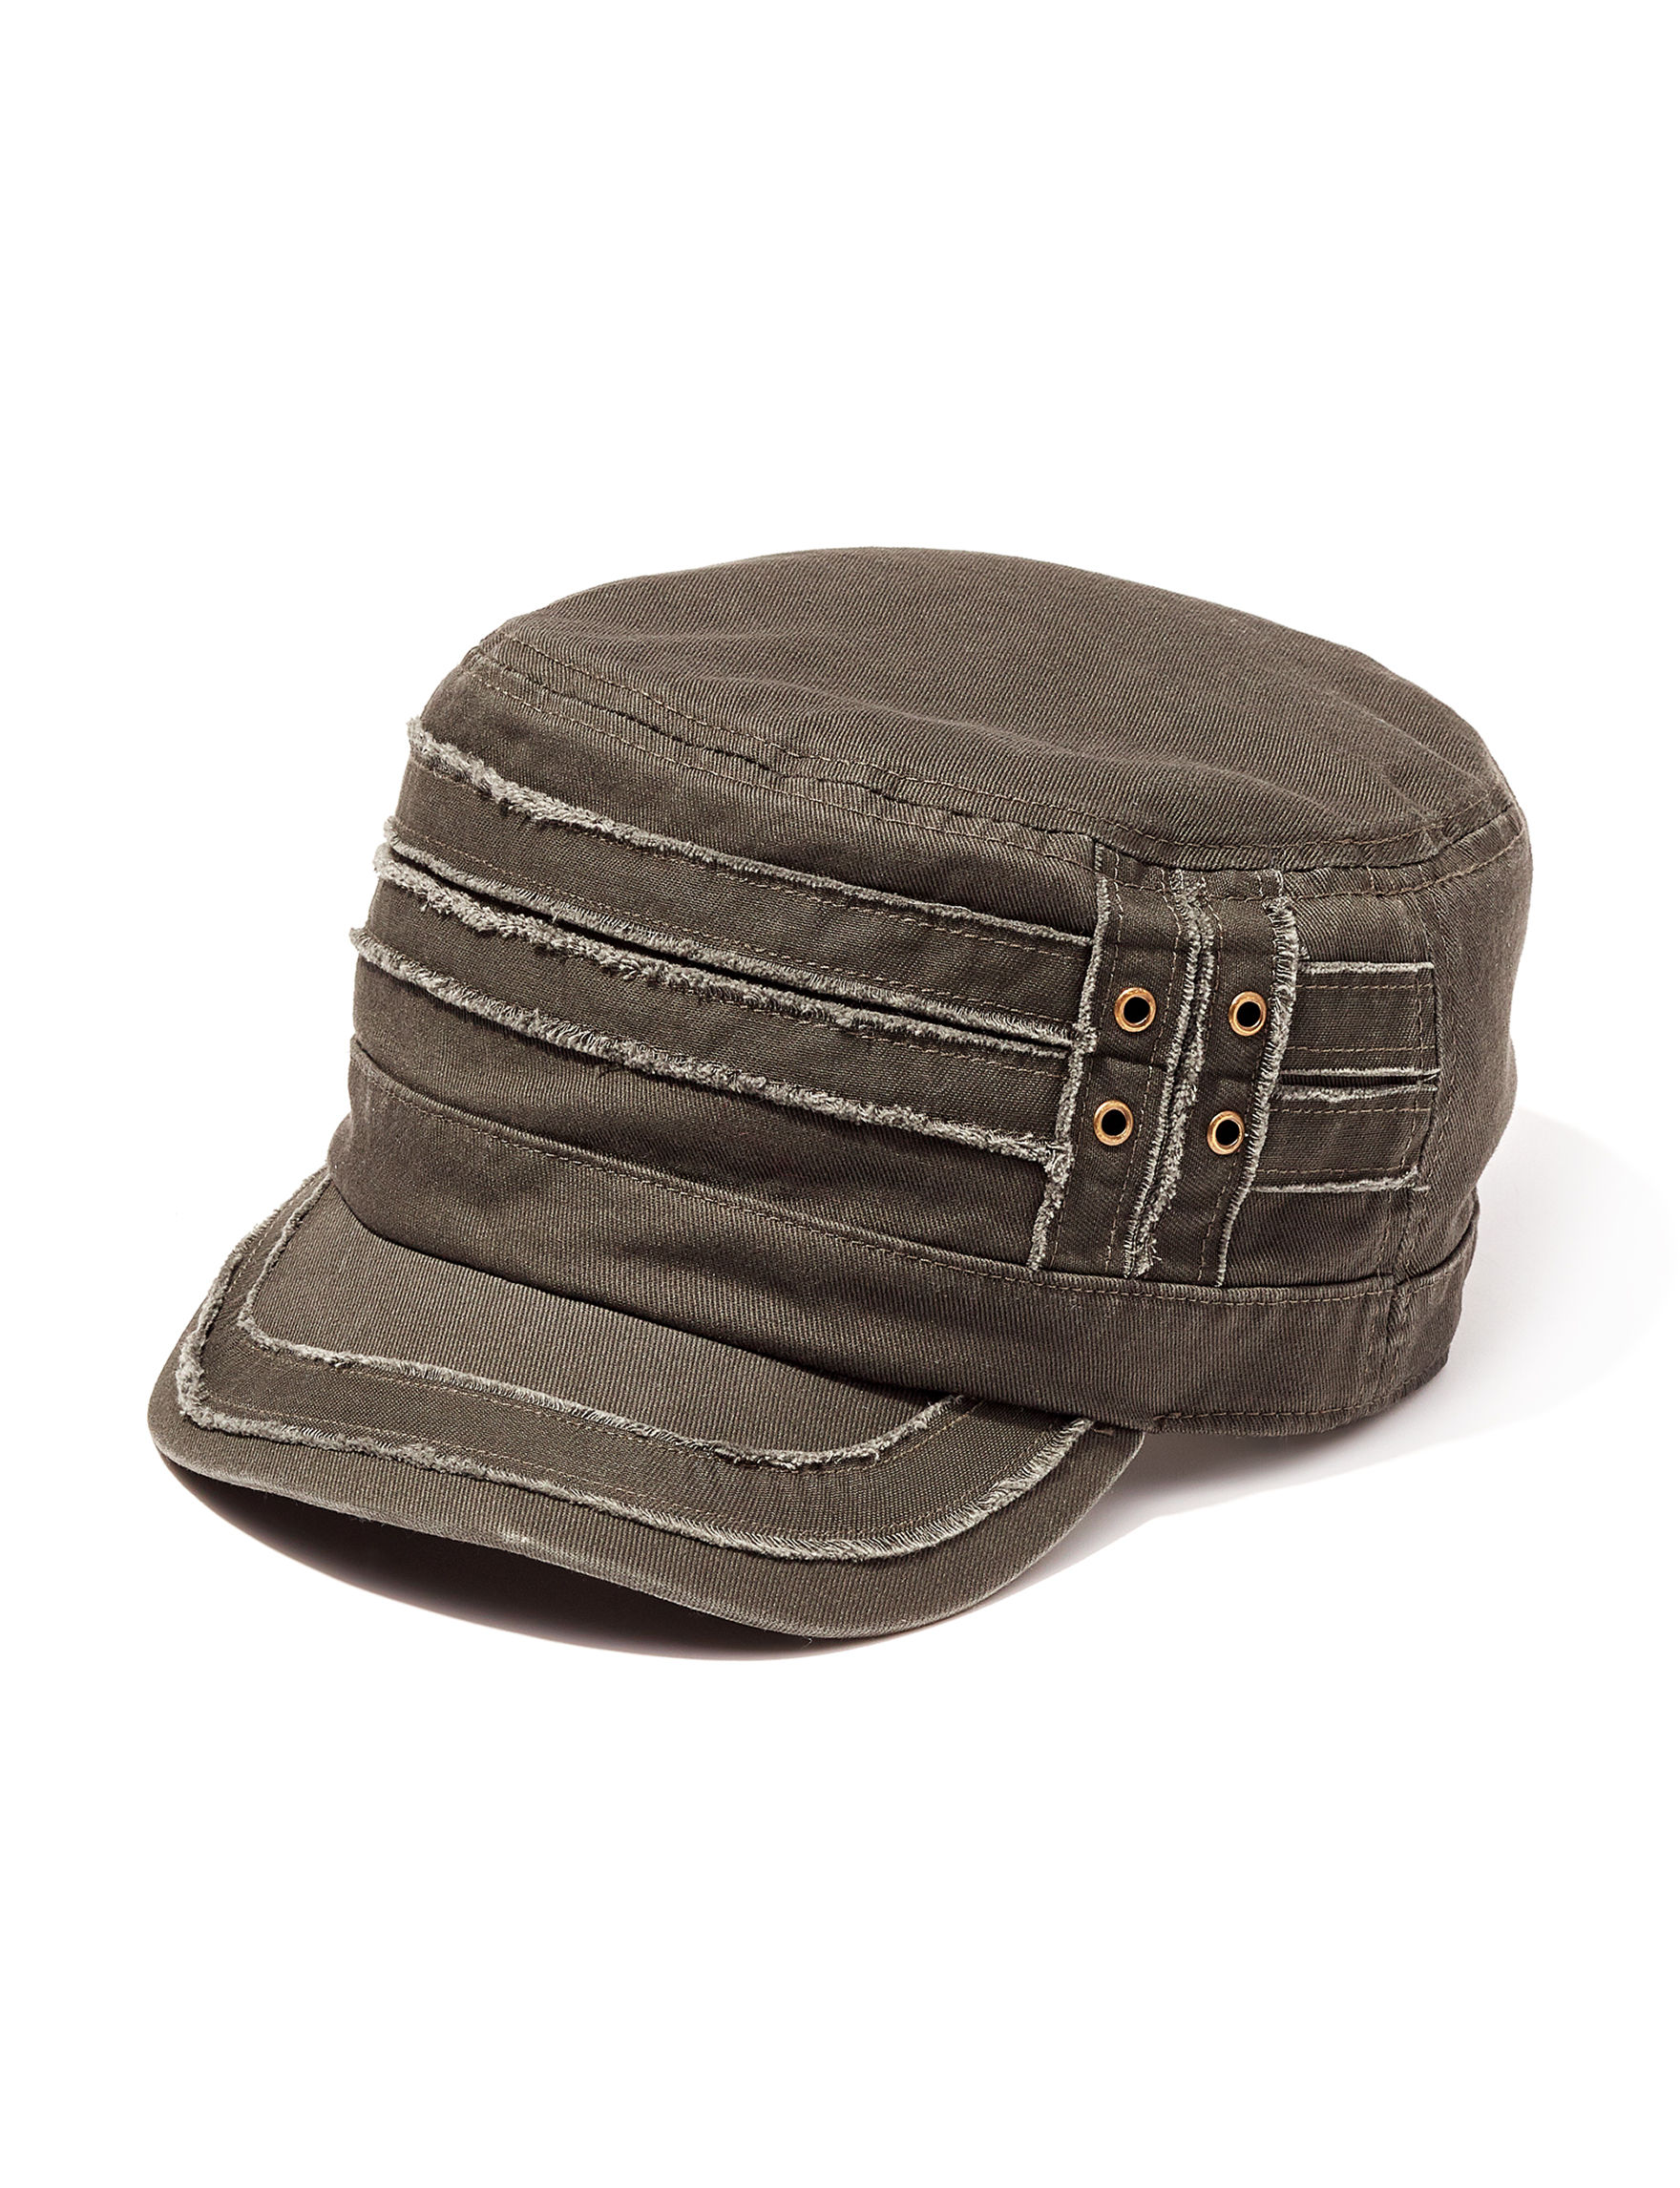 David & Young Dark Grey Hats & Headwear